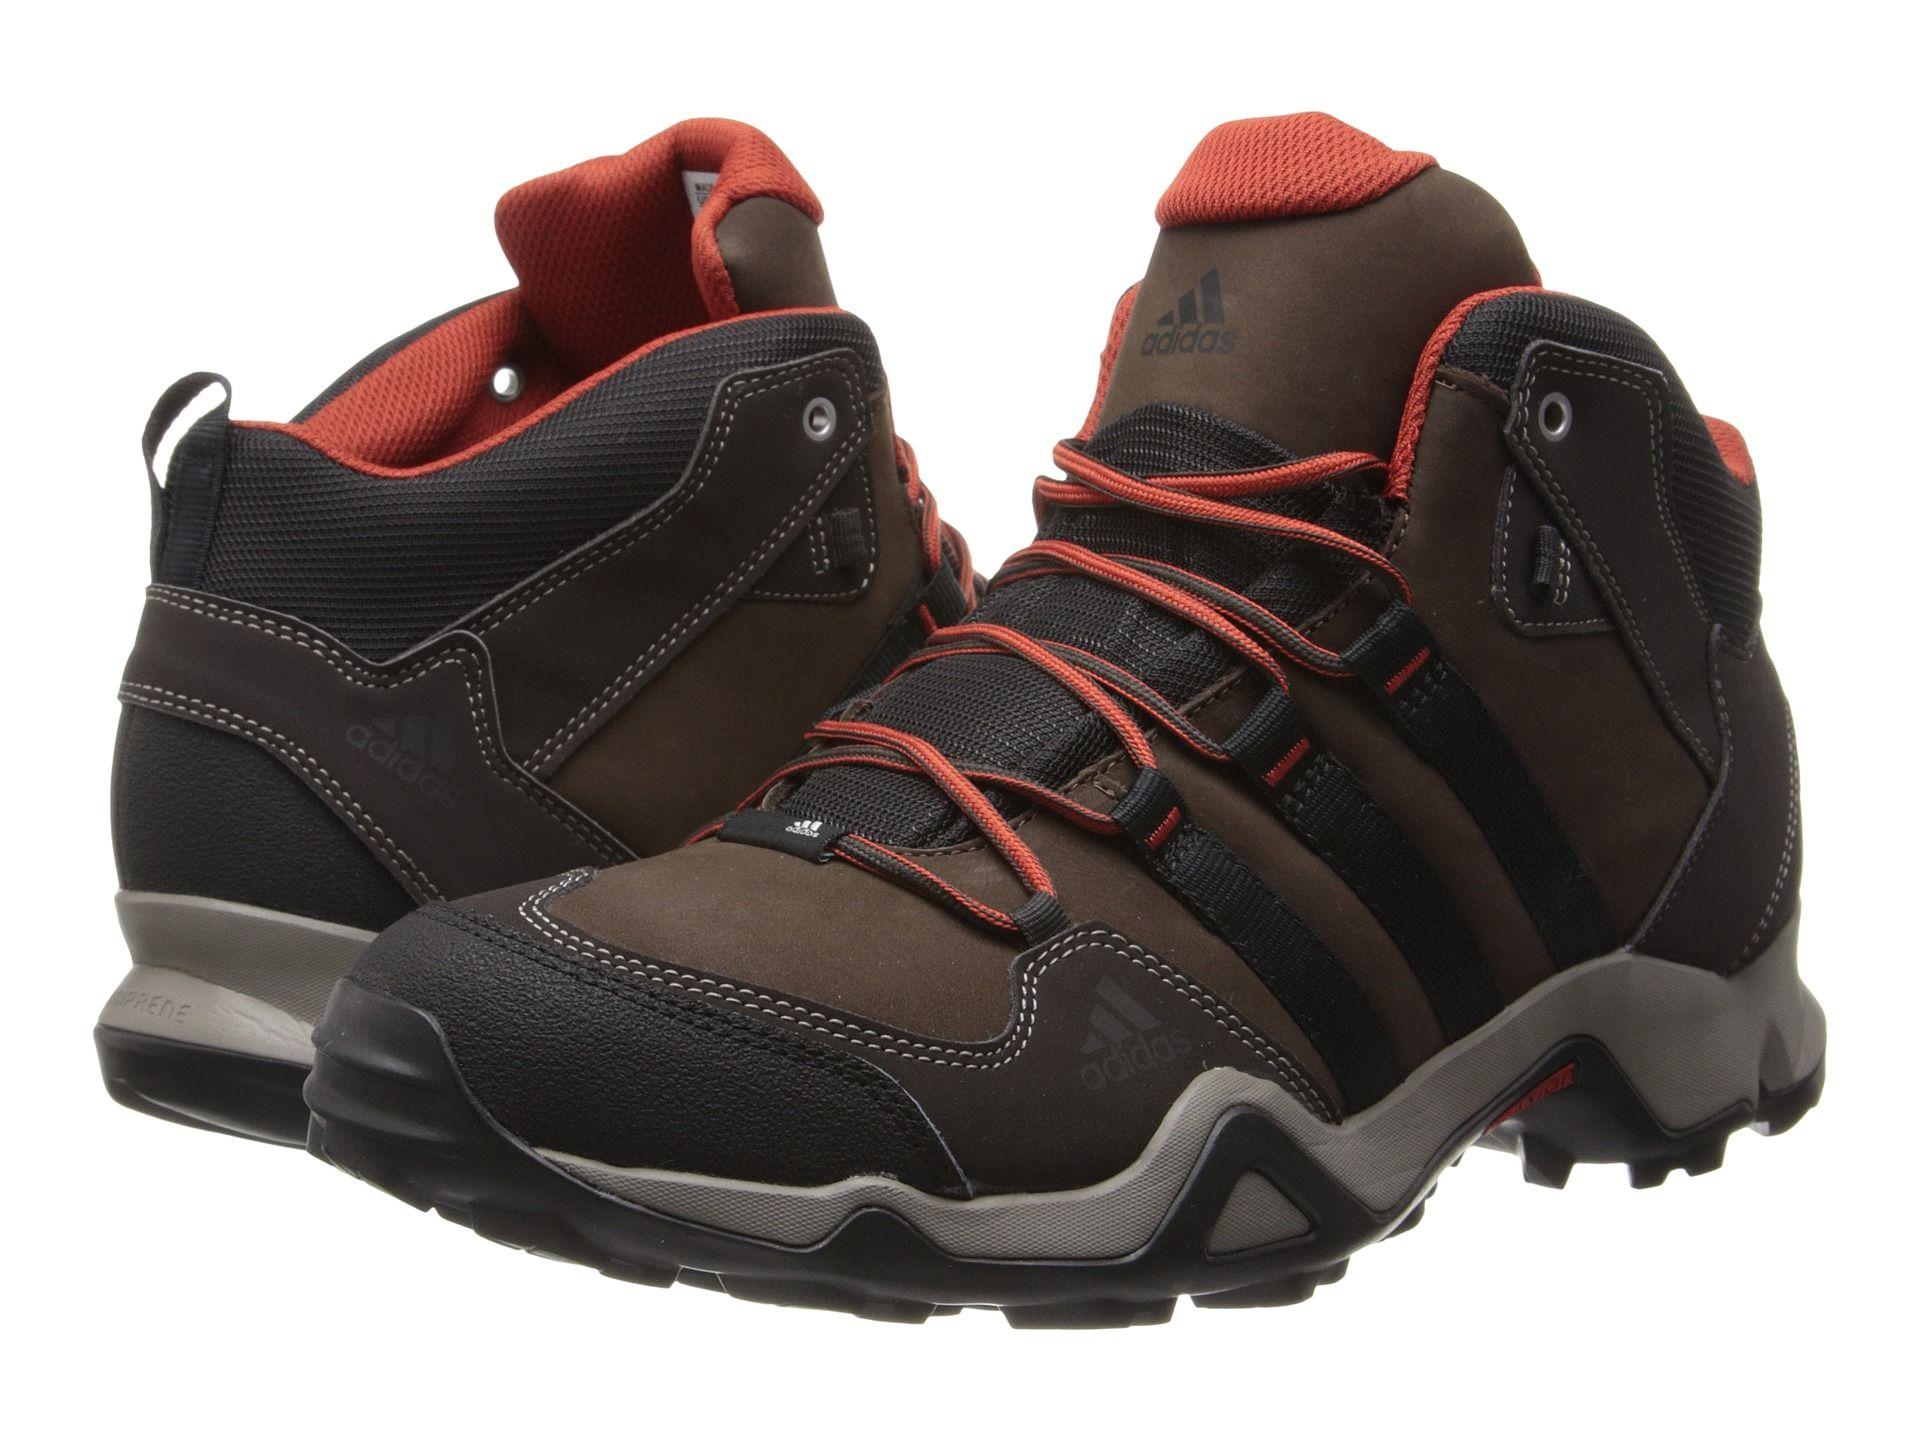 adidas Outdoor Brushwood Mid Leather - Espresso/Black/Titan Grey